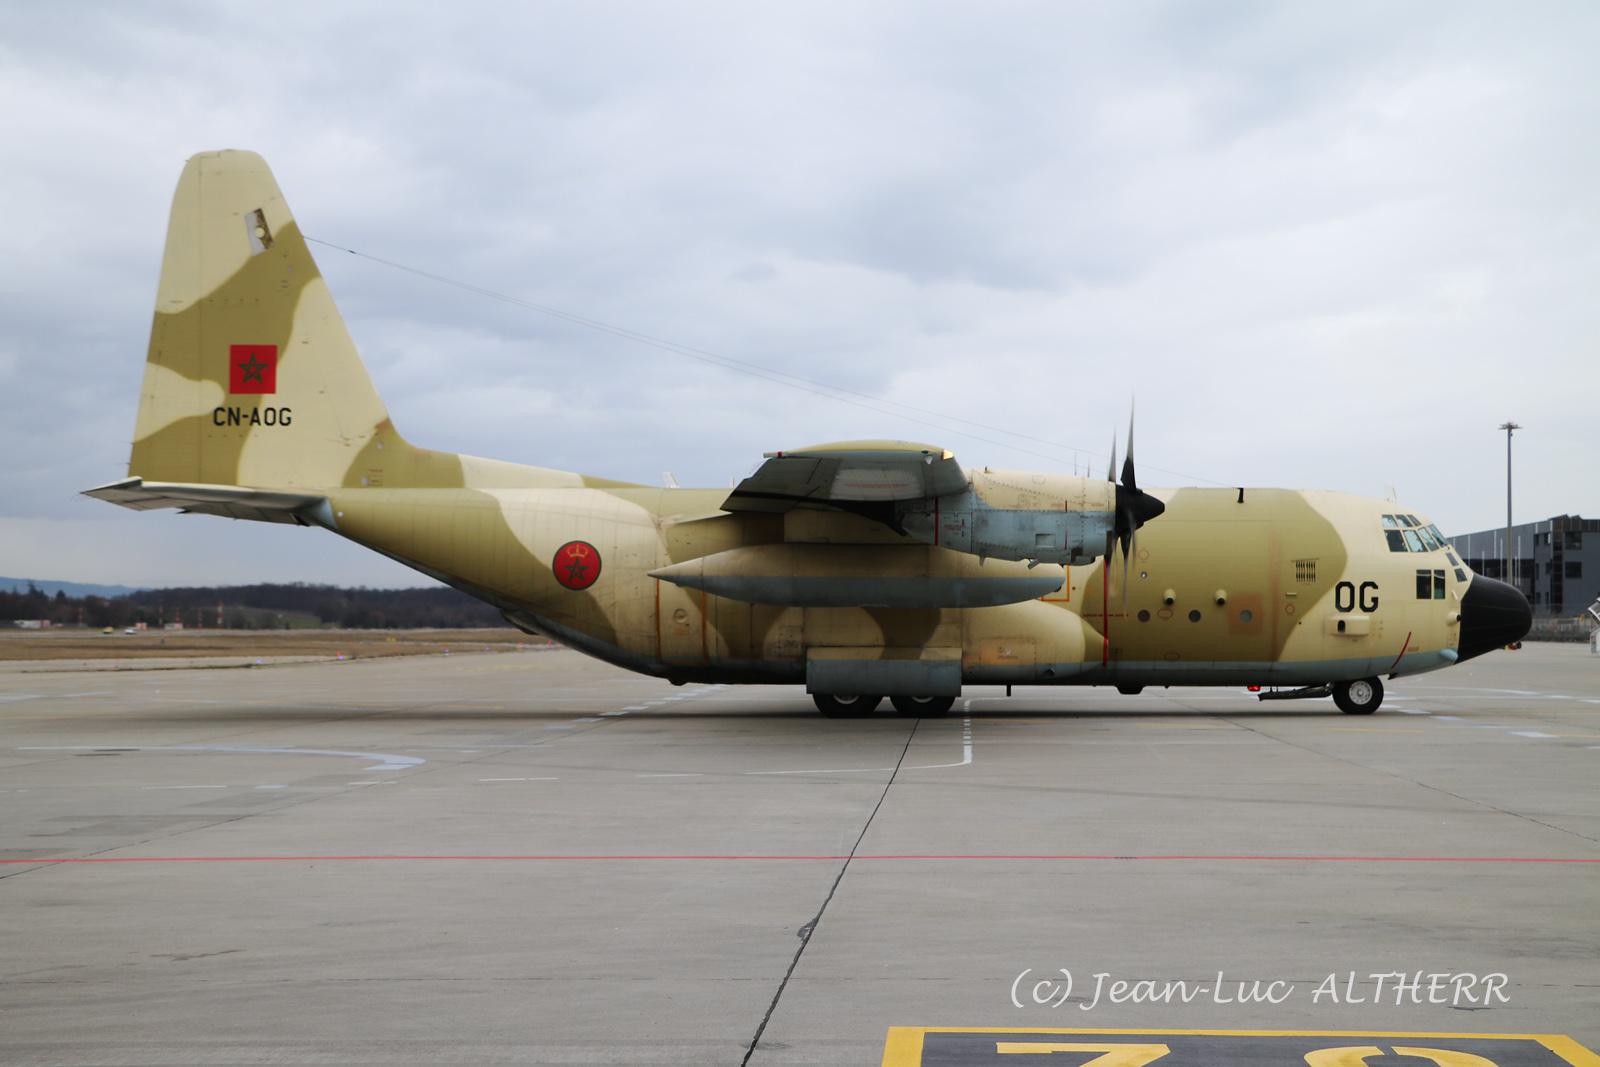 FRA: Photos d'avions de transport - Page 37 33441751138_42c22b4c5b_o